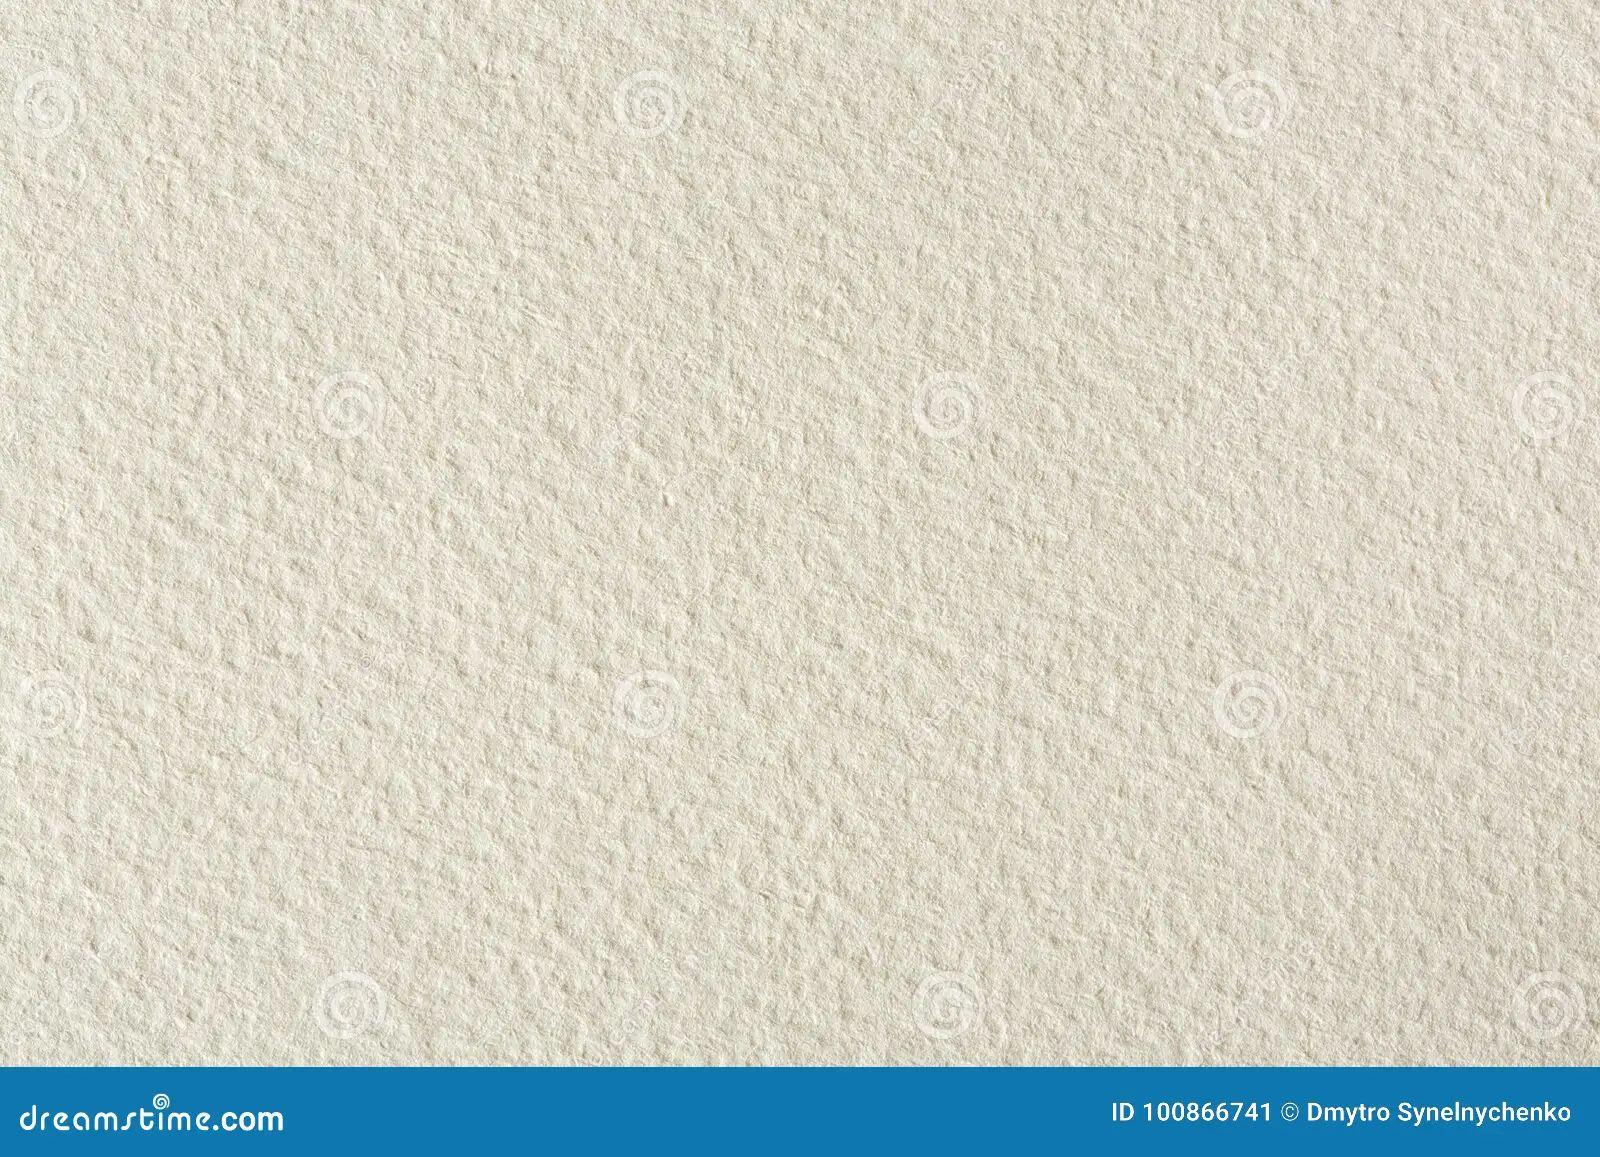 cardboard texture high resolution